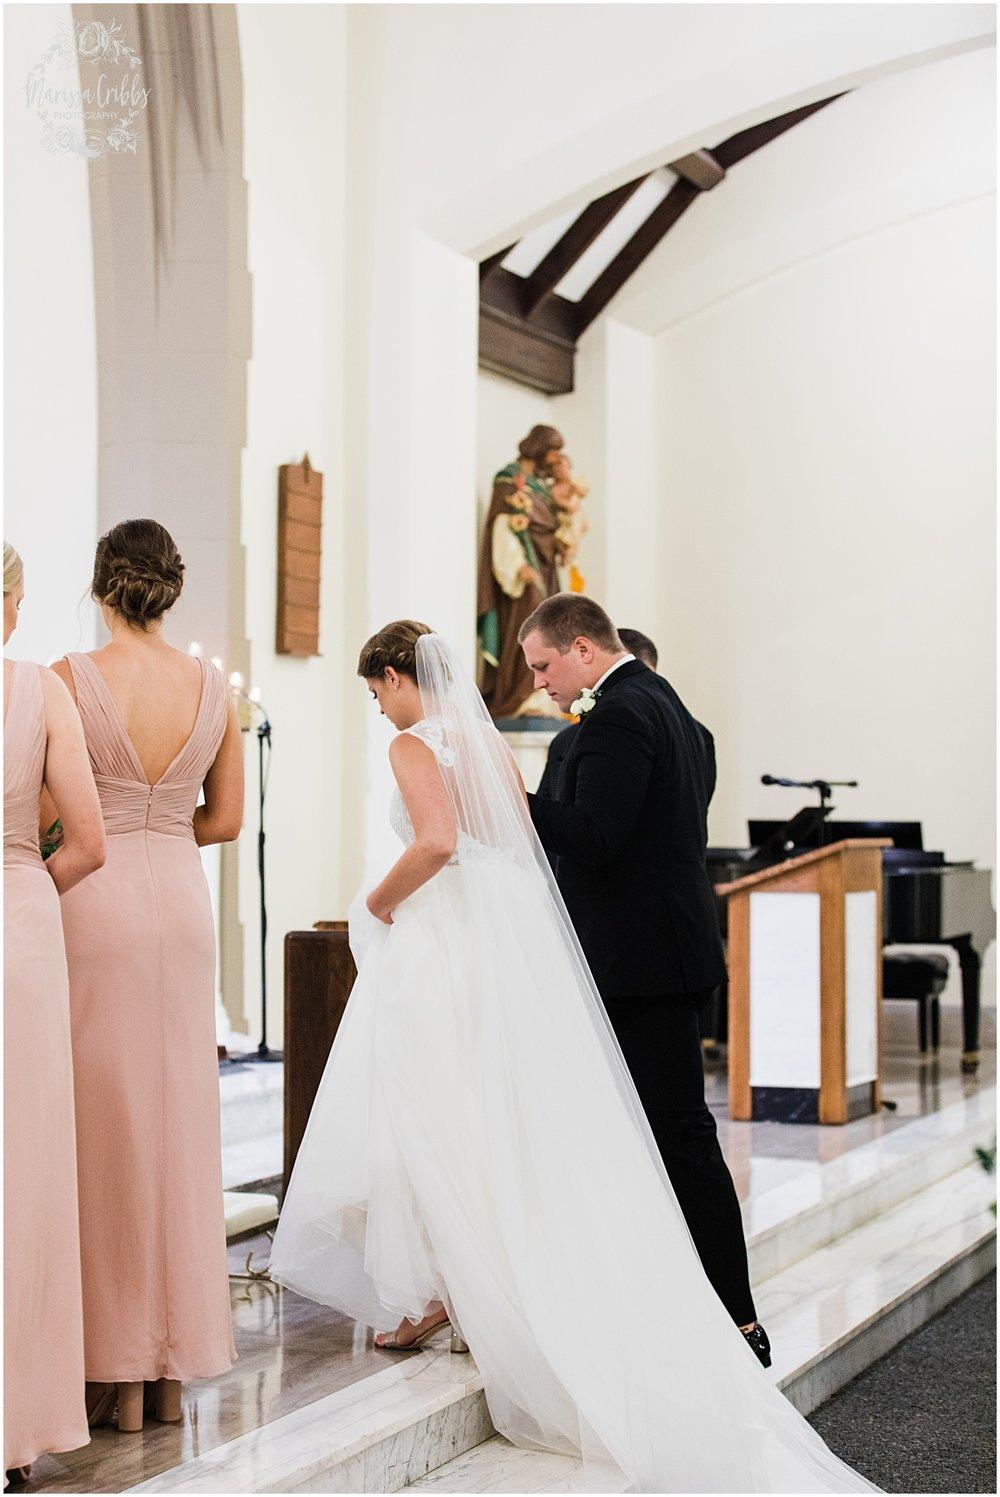 LAKE QUIVIRA COUNTRY CLUB WEDDING | MORGAN & RYAN | MARISSA CRIBBS PHOTOGRAPHY_5440.jpg